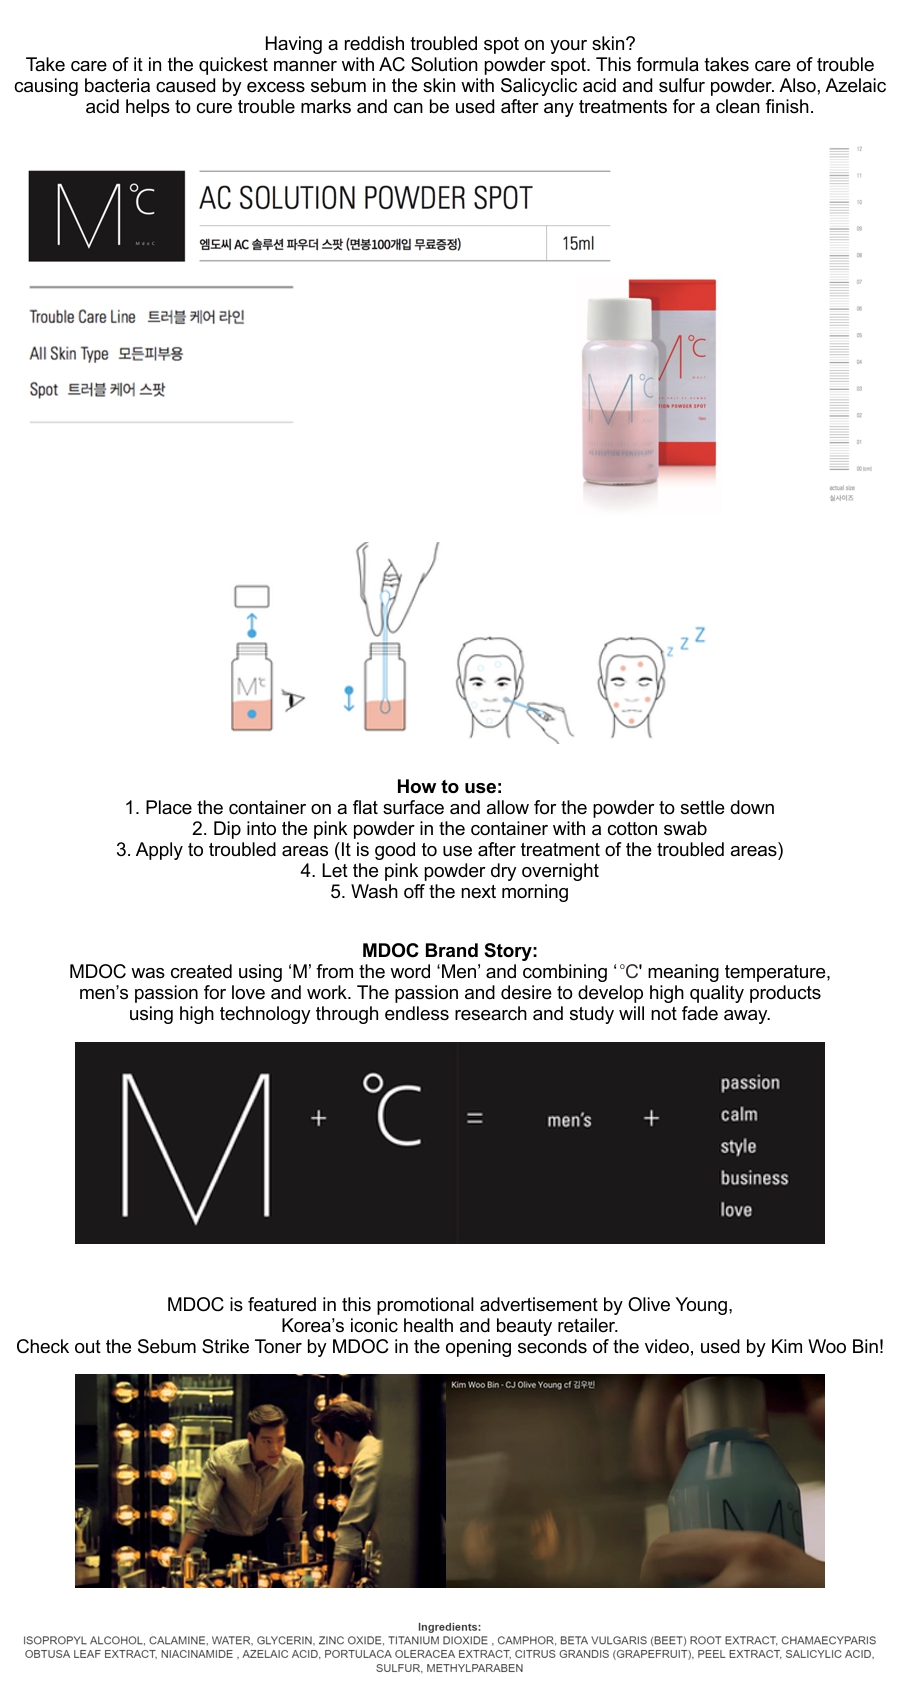 MdoC AC Solution Powder Spot